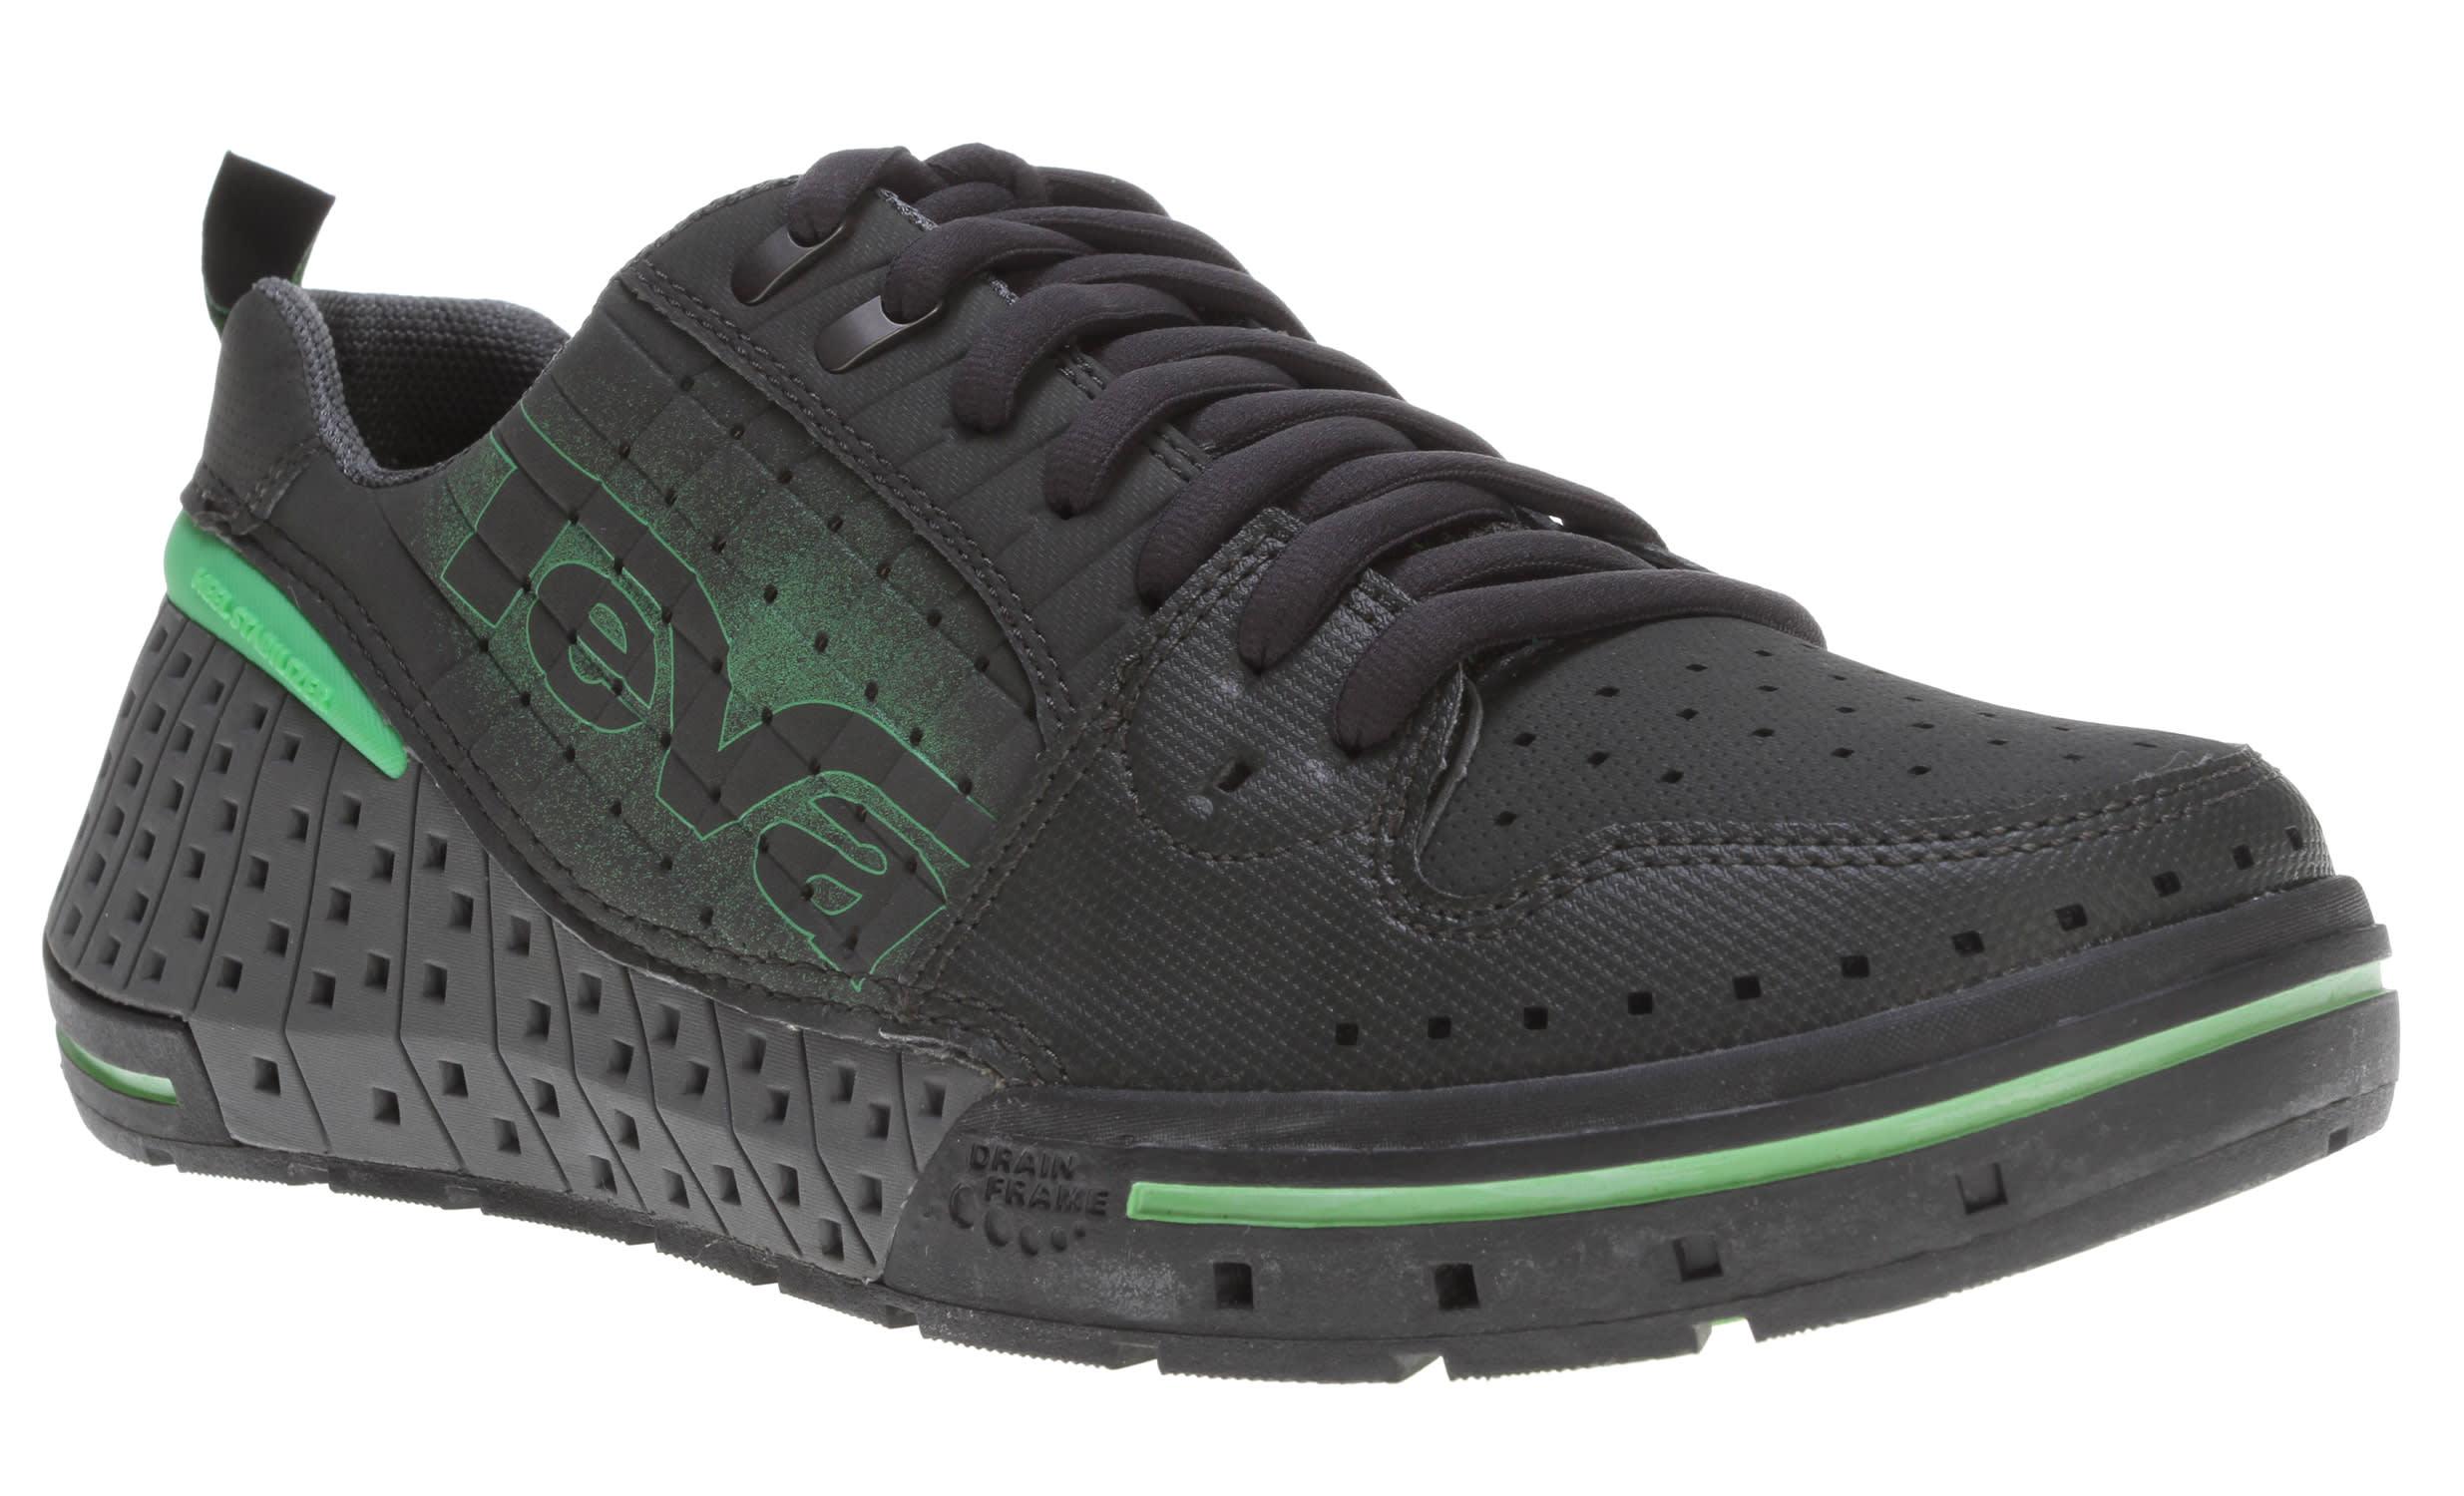 e1589f1ad Teva Gnarkosi Wakeskate Shoes - thumbnail 2